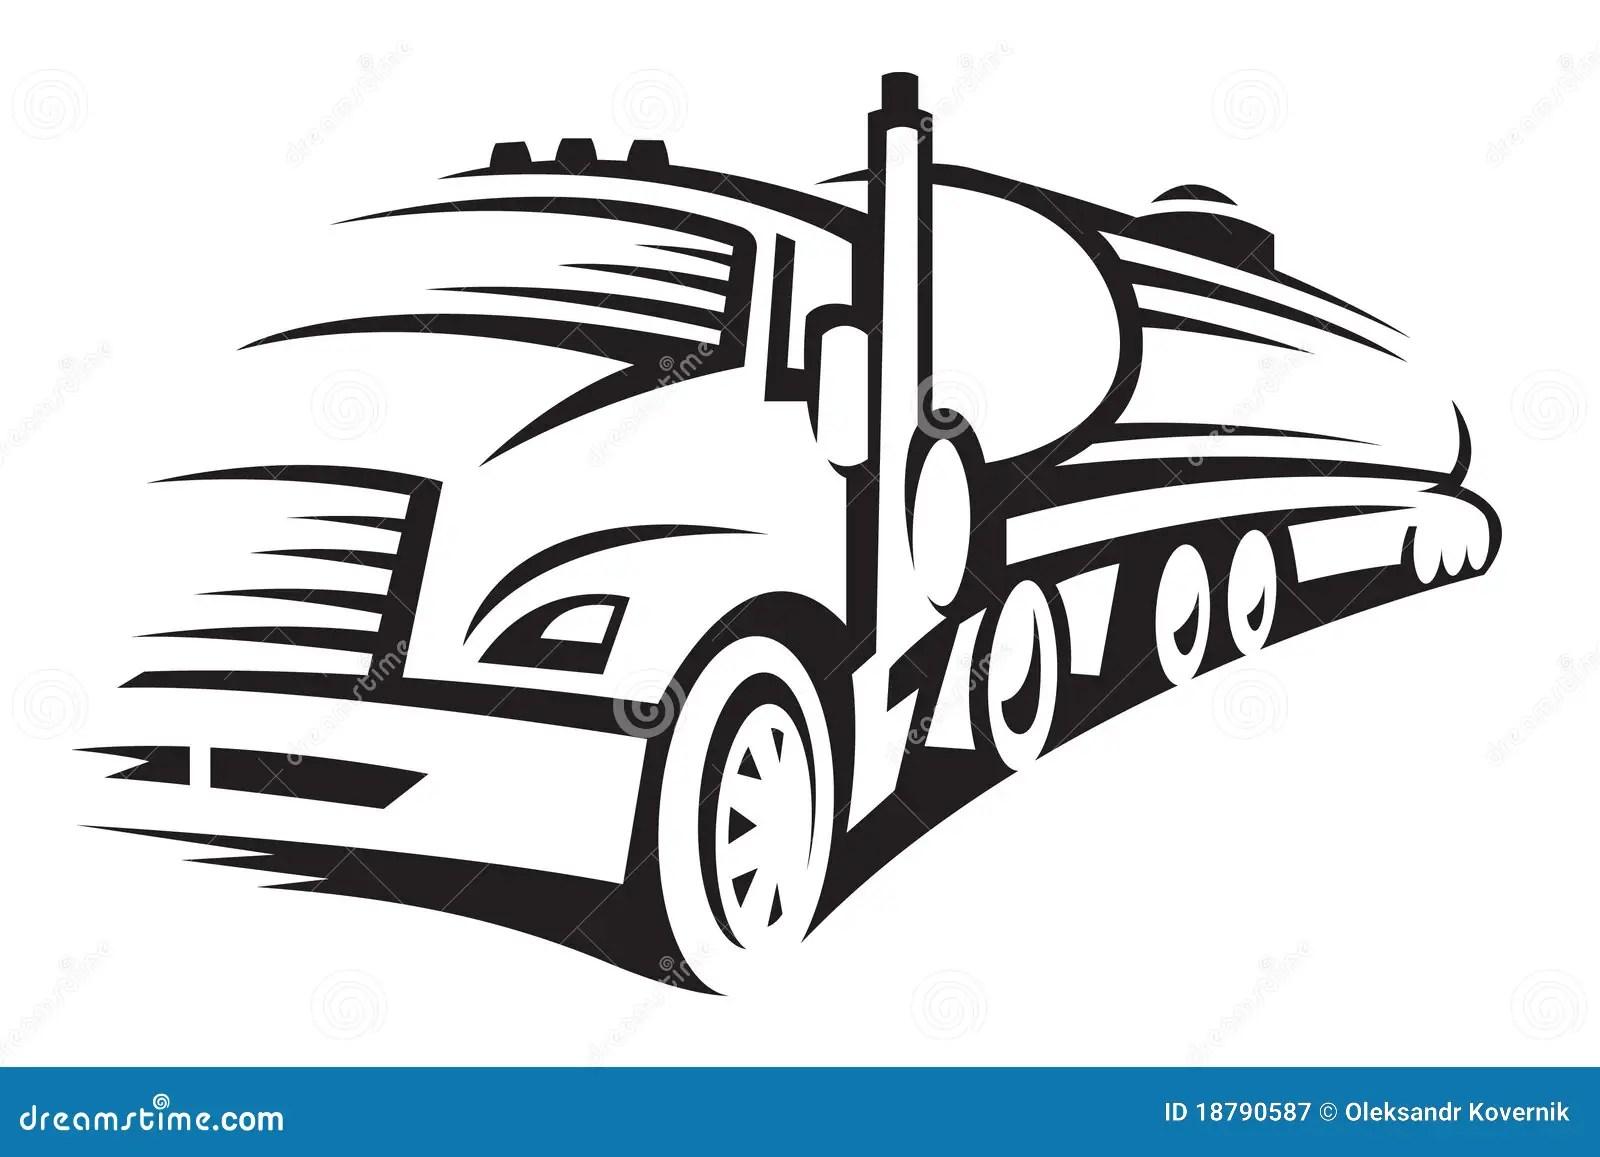 Semi Trailer Fuel Tanker, Semi, Free Engine Image For User